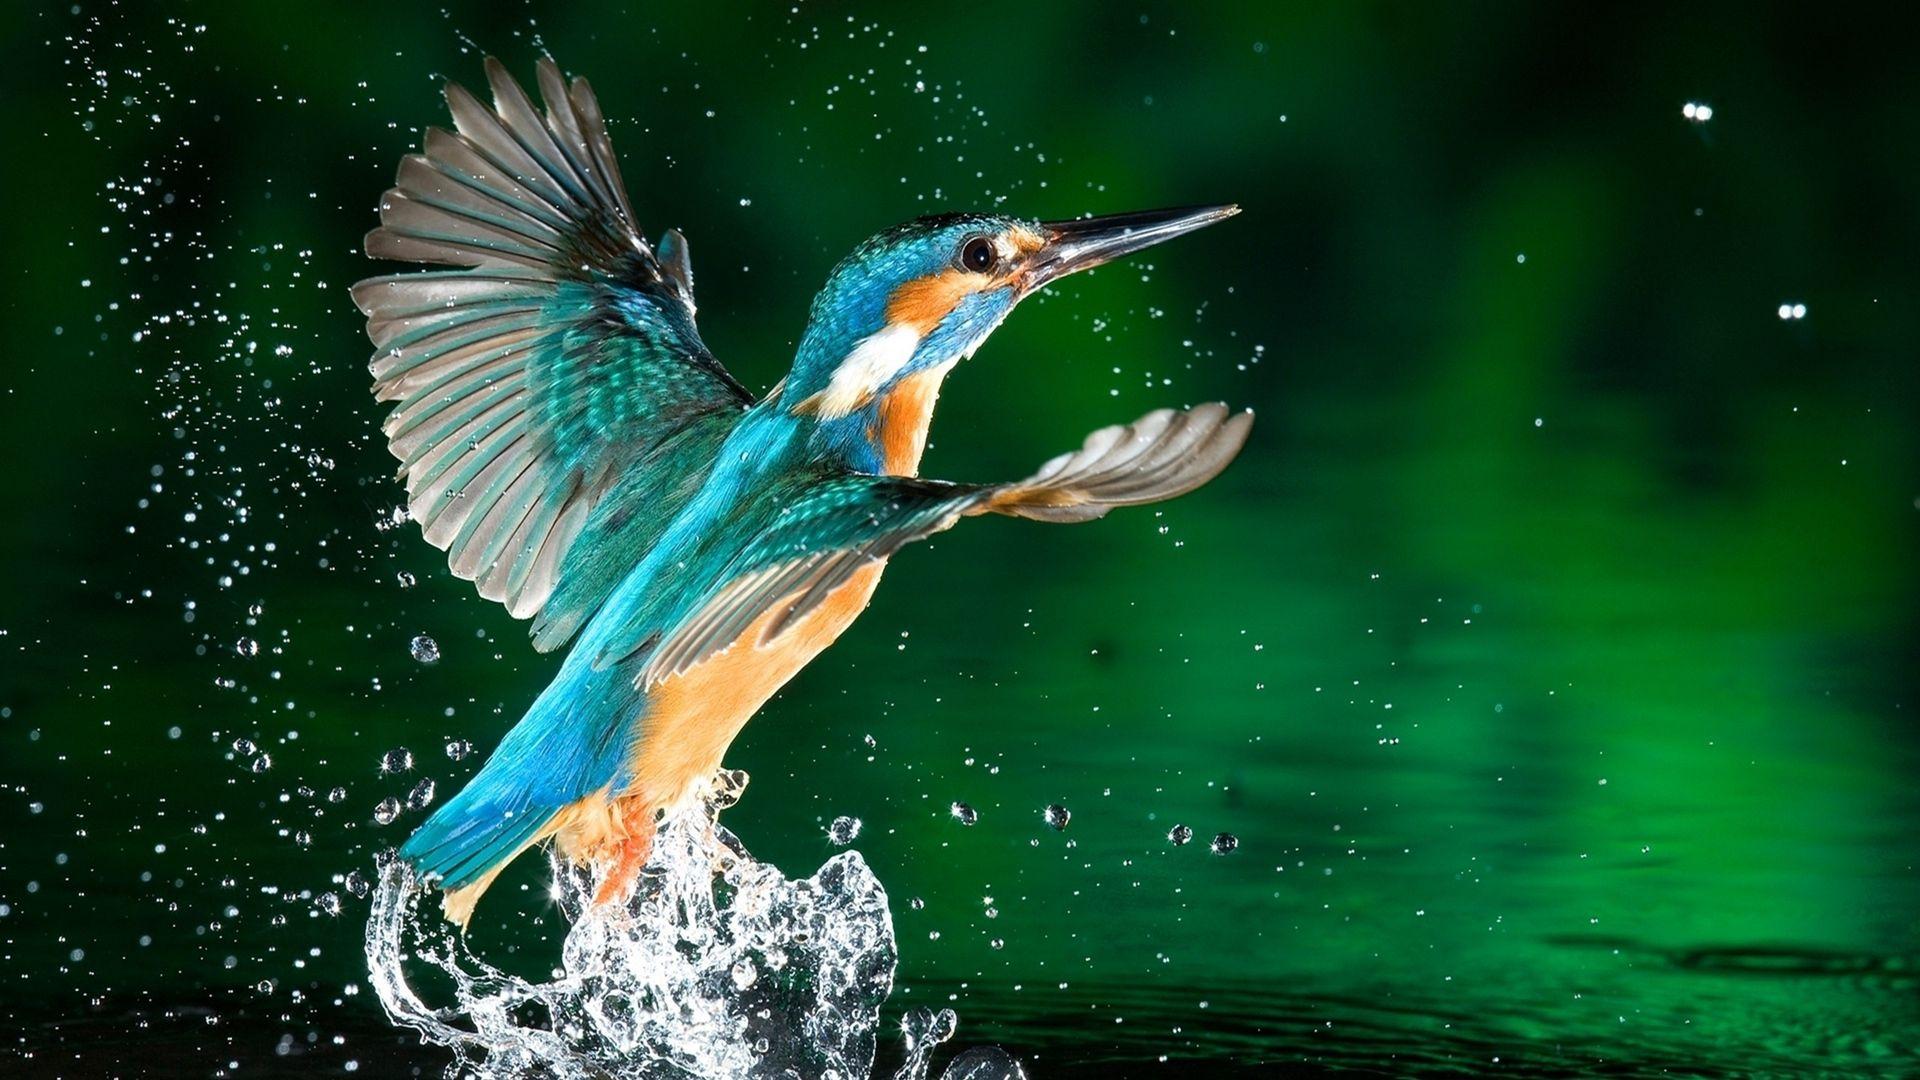 Kingfisher Wallpaper Desktop